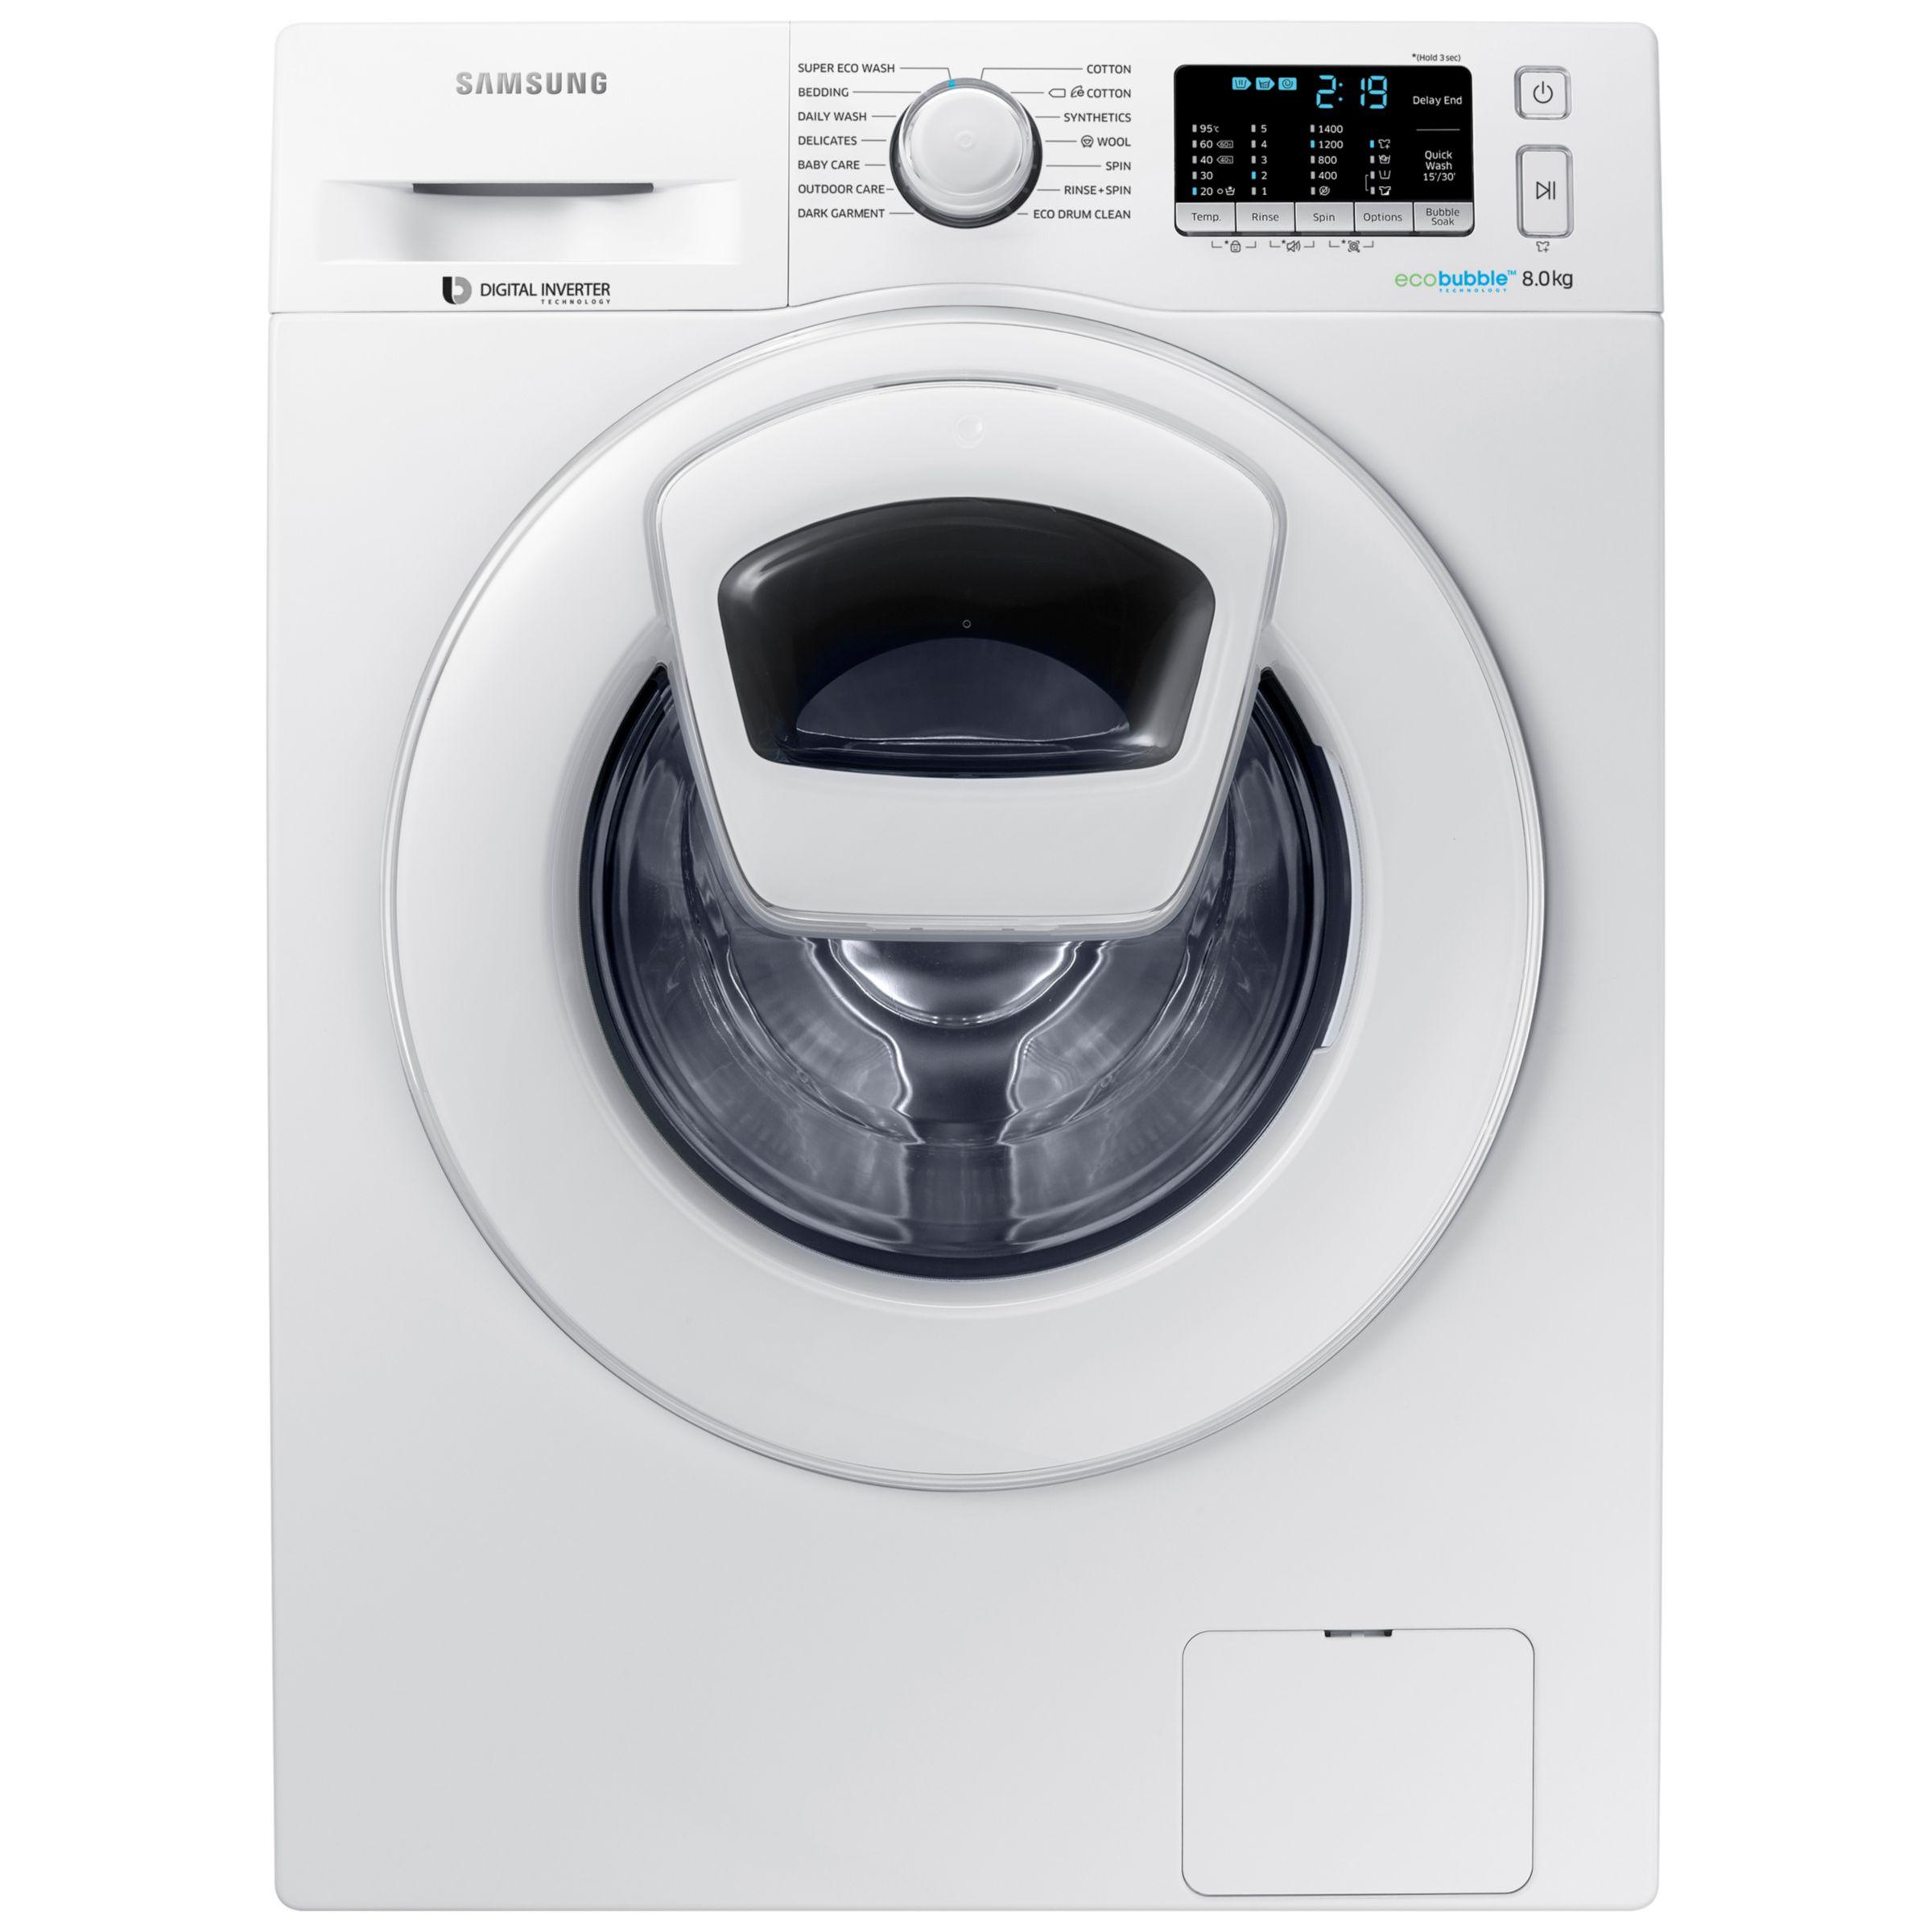 Samsung Samsung AddWash WW80K5410WW/EU Washing Machine, 8kg Load, A+++ Energy Rating, 1400rpm Spin, White